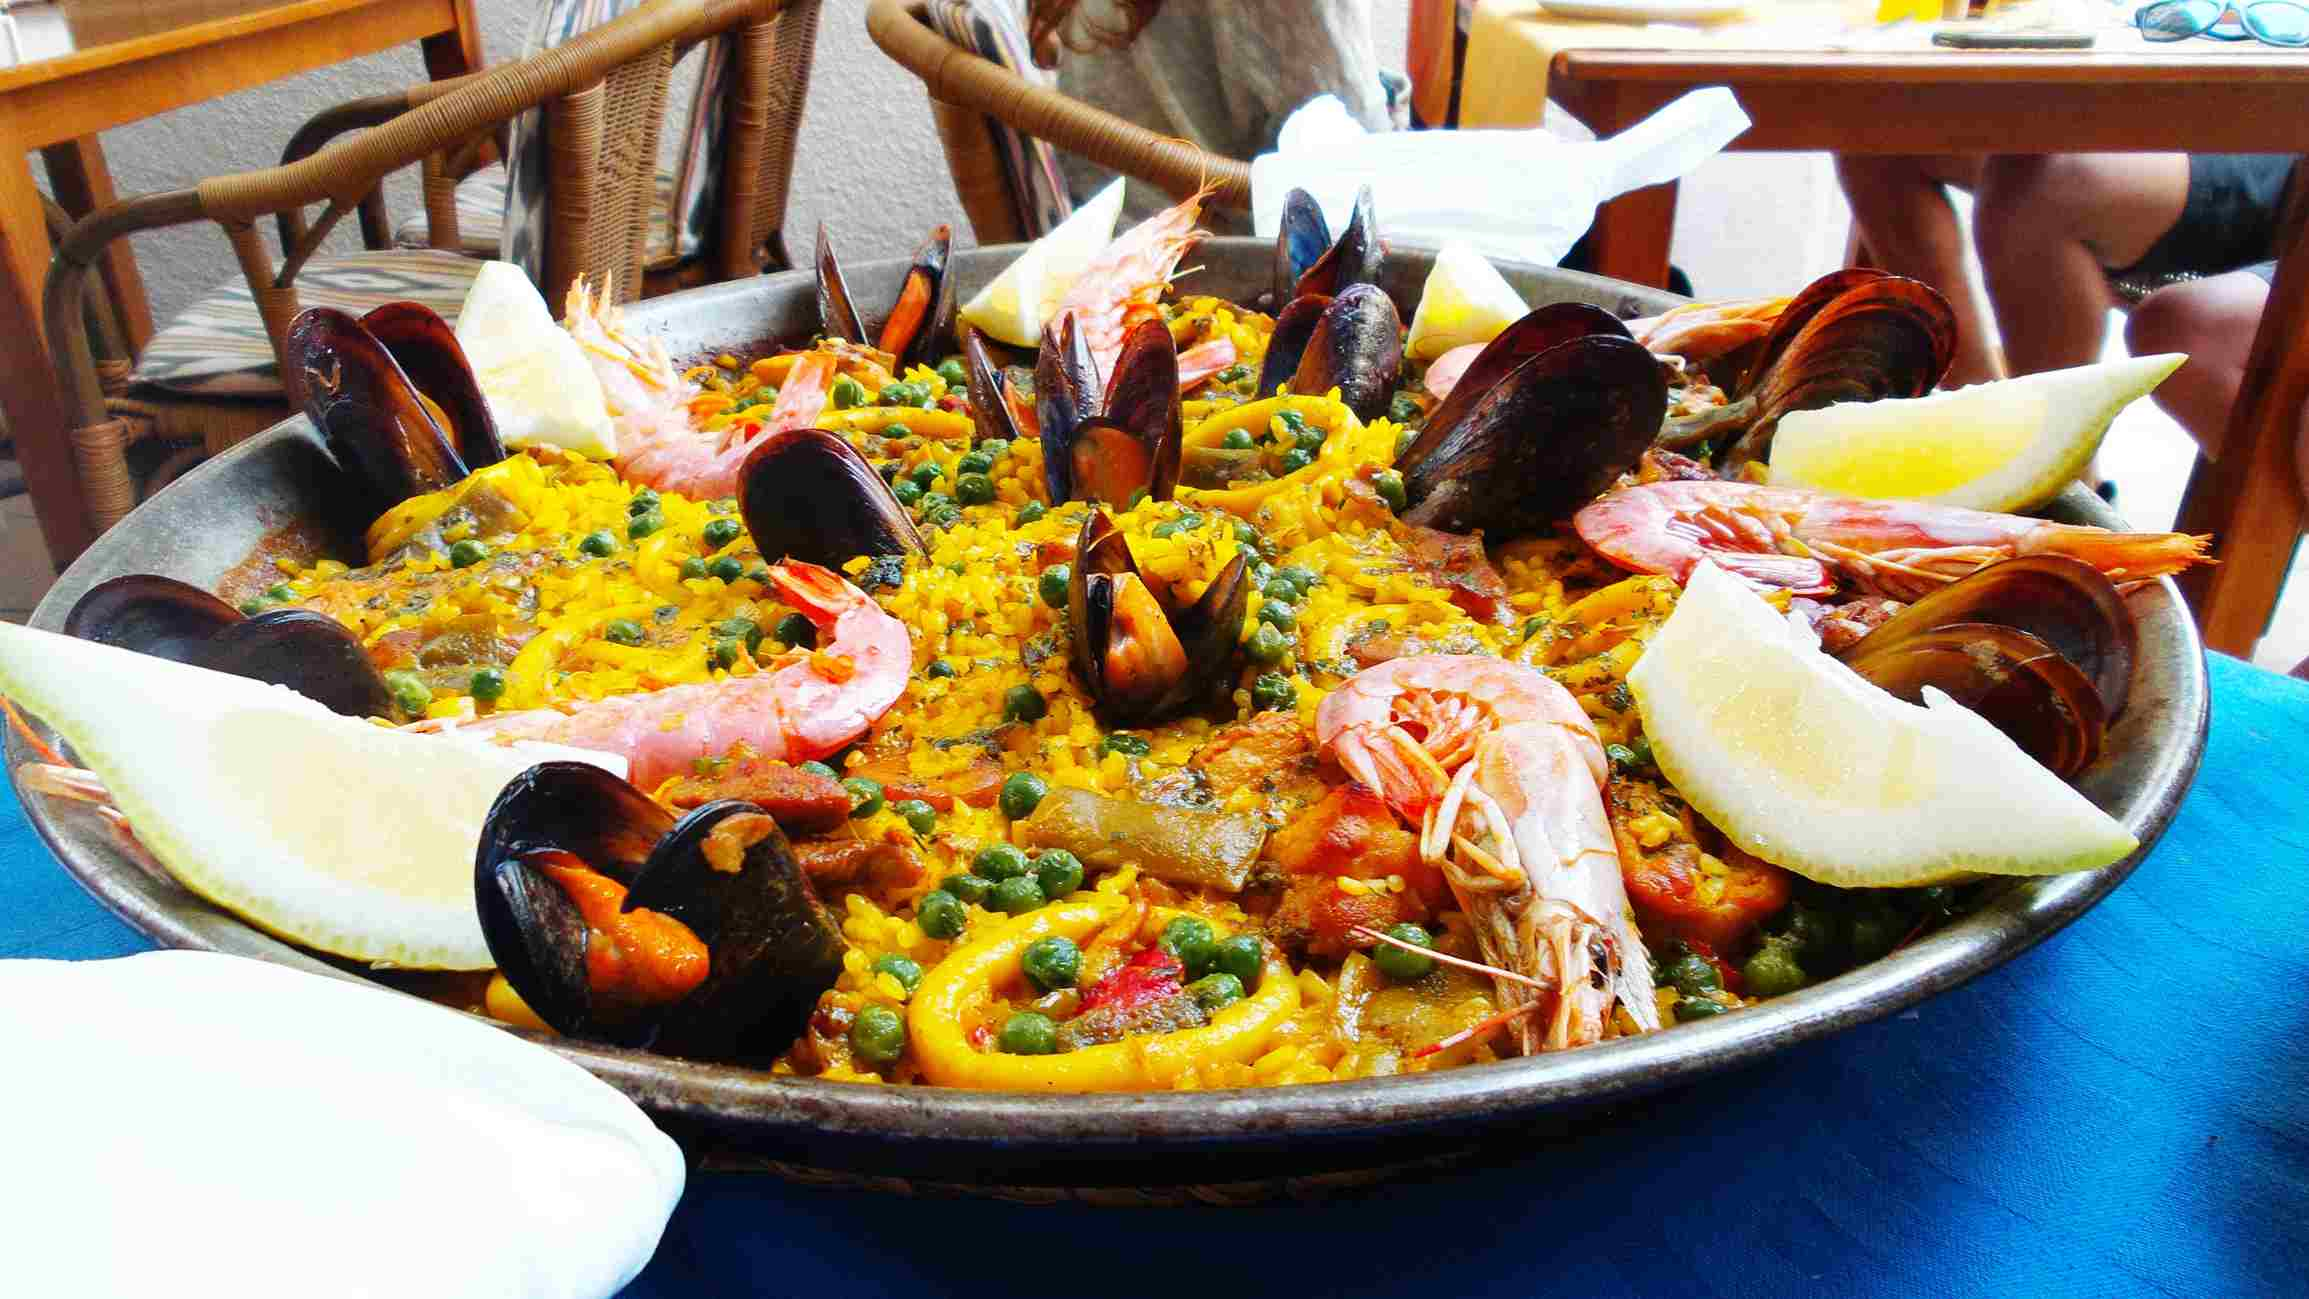 A dish of seafood paella.